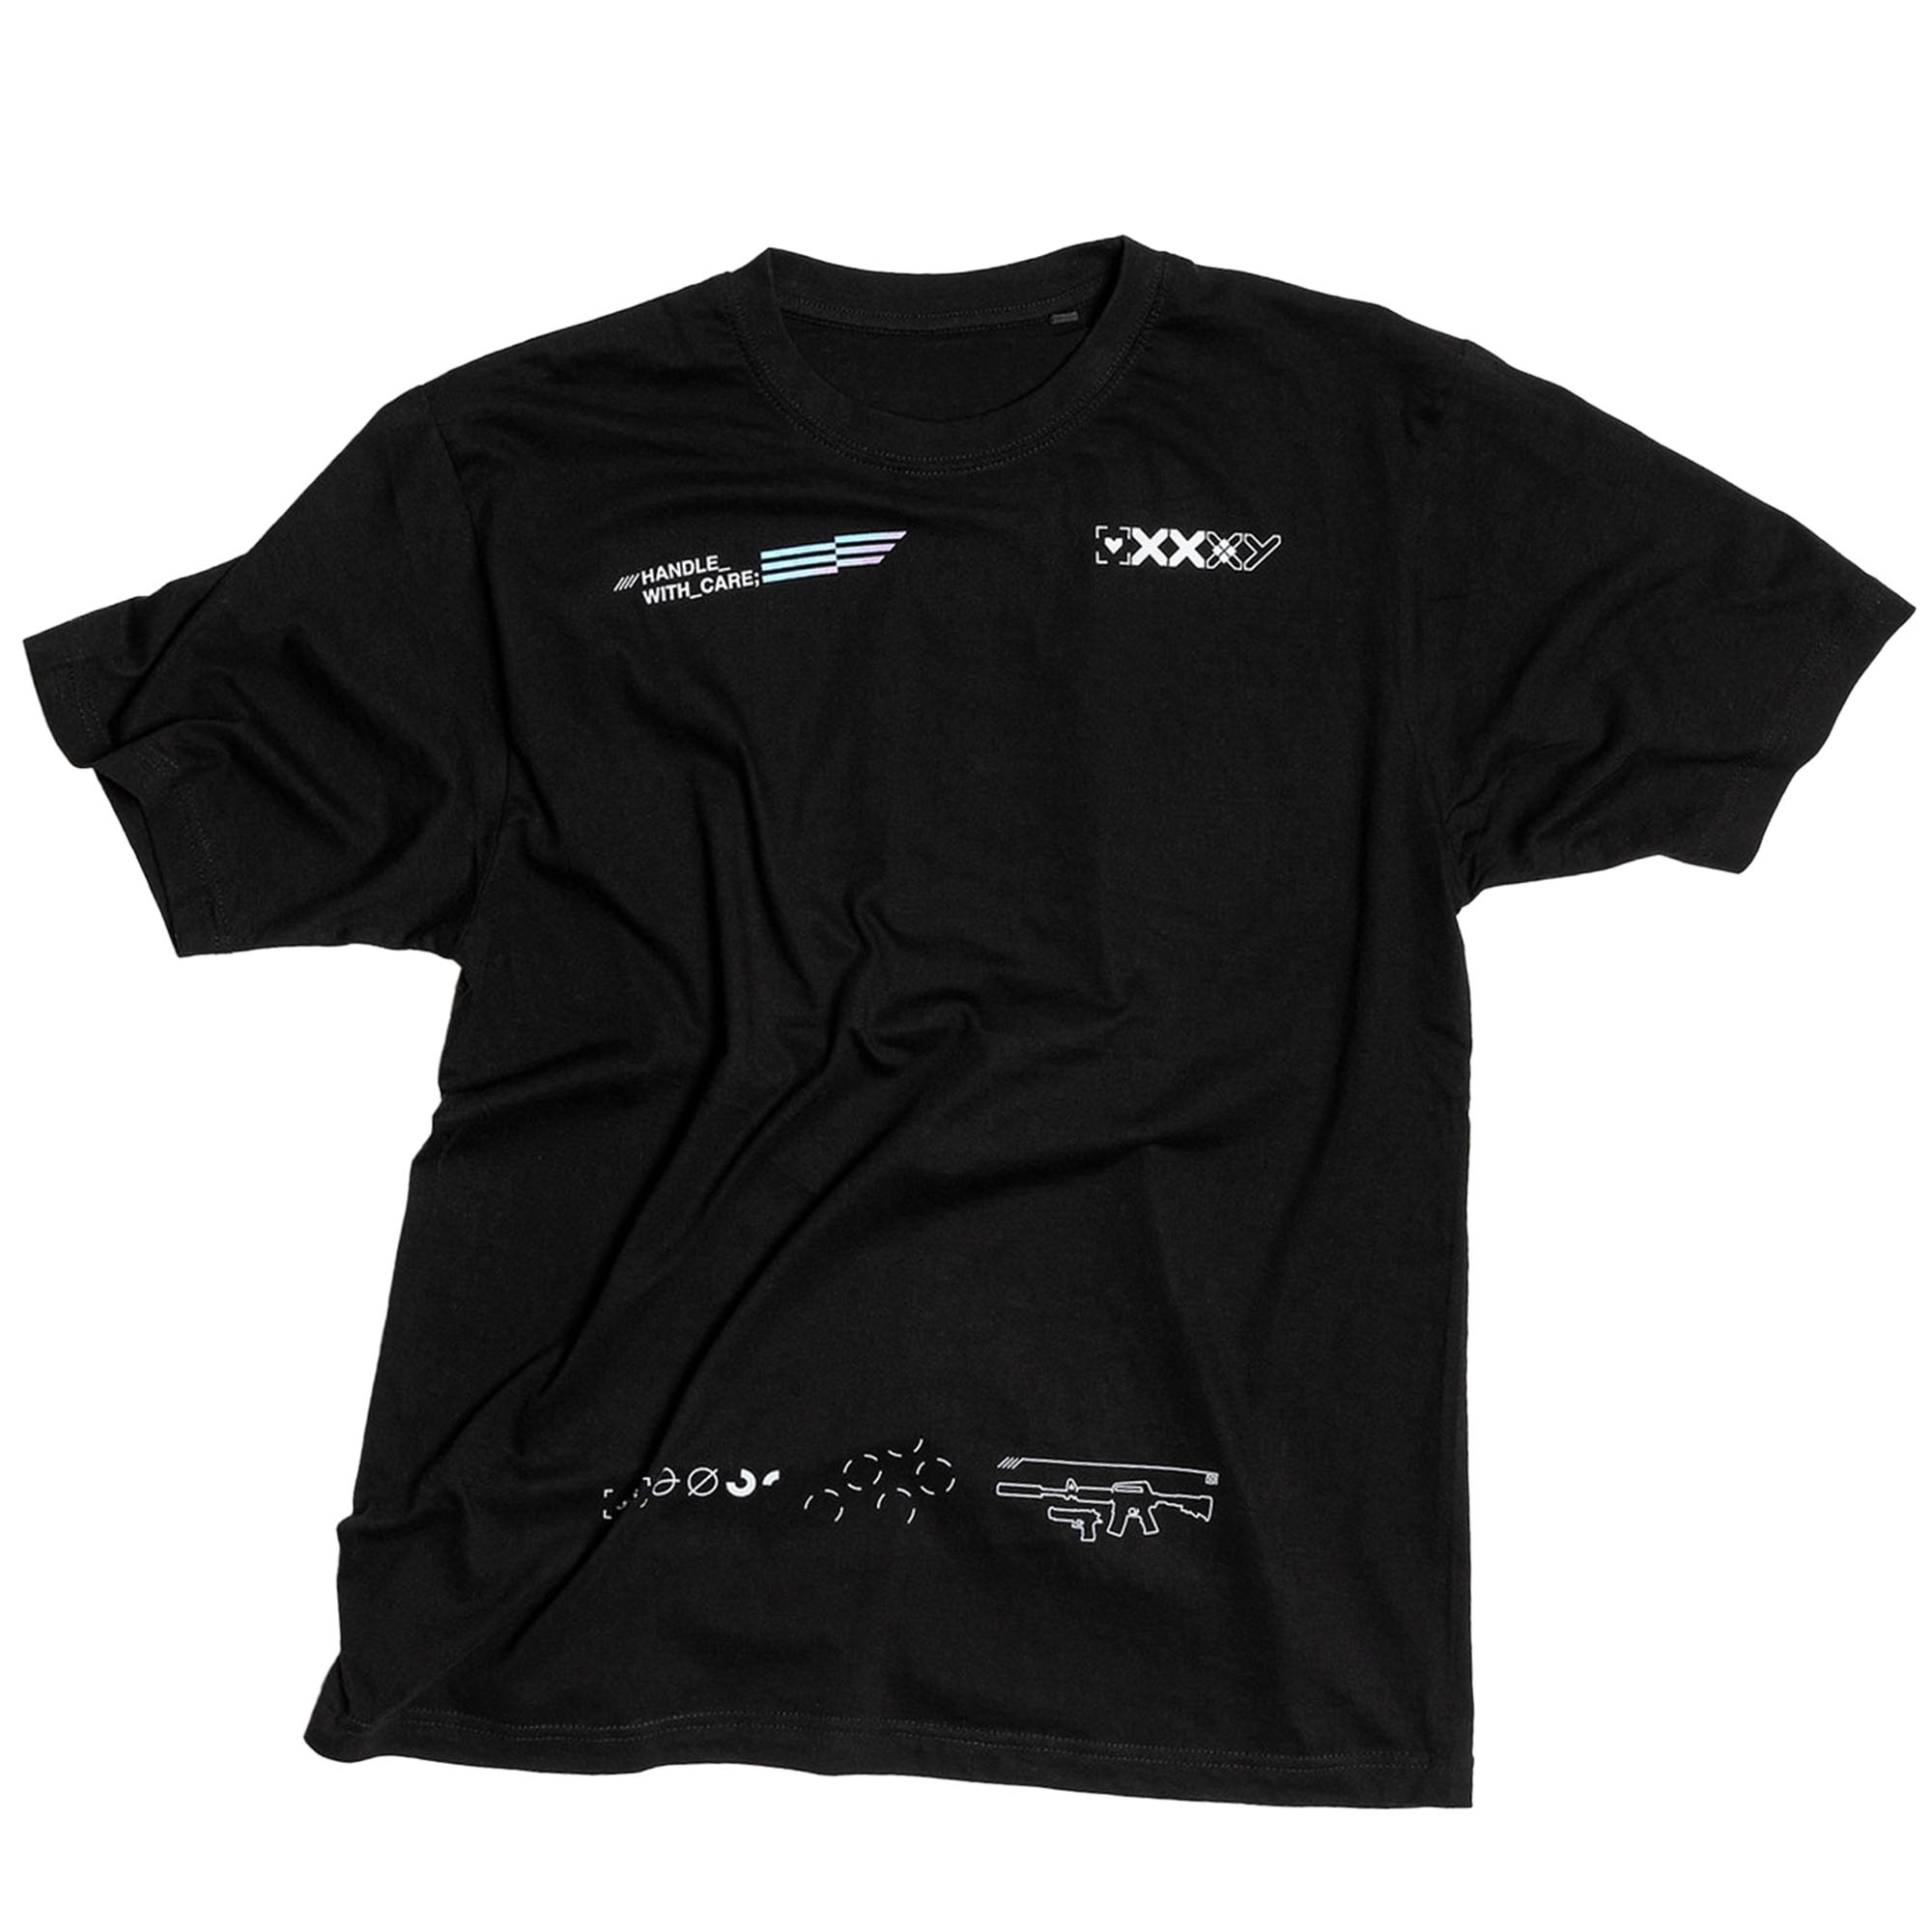 Camiseta Printstream NIP Oficial 2021 Preta